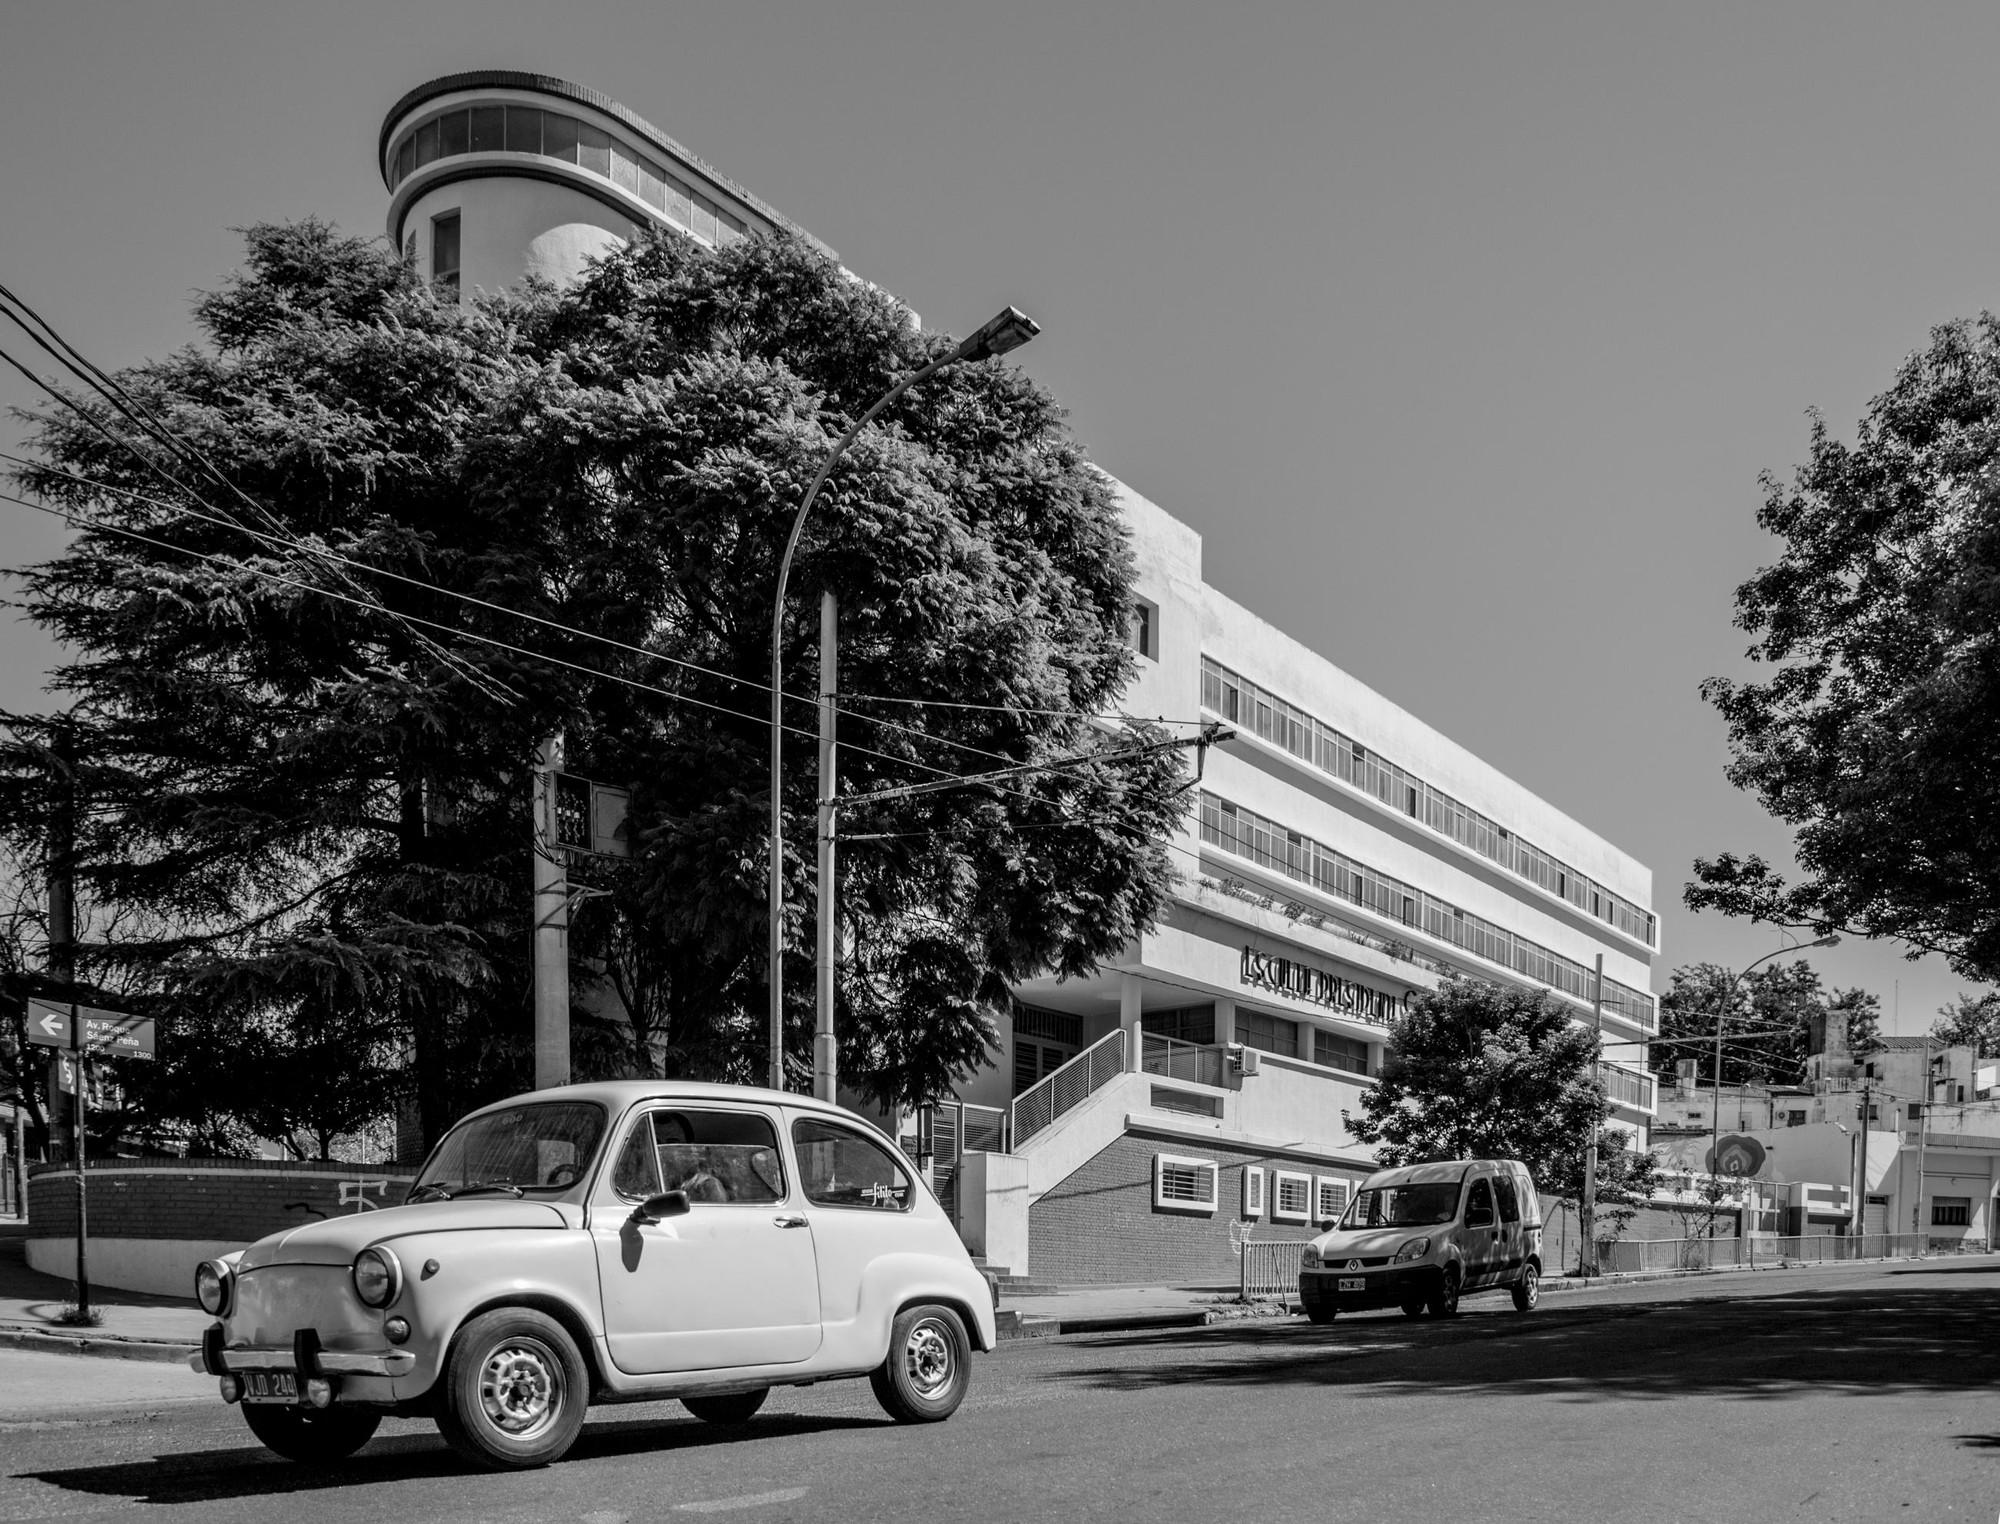 Clásicos de Arquitectura: Escuela Presidente Sarmiento / Nicolás Juárez Cáceres, © Arq. Gonzalo Viramonte